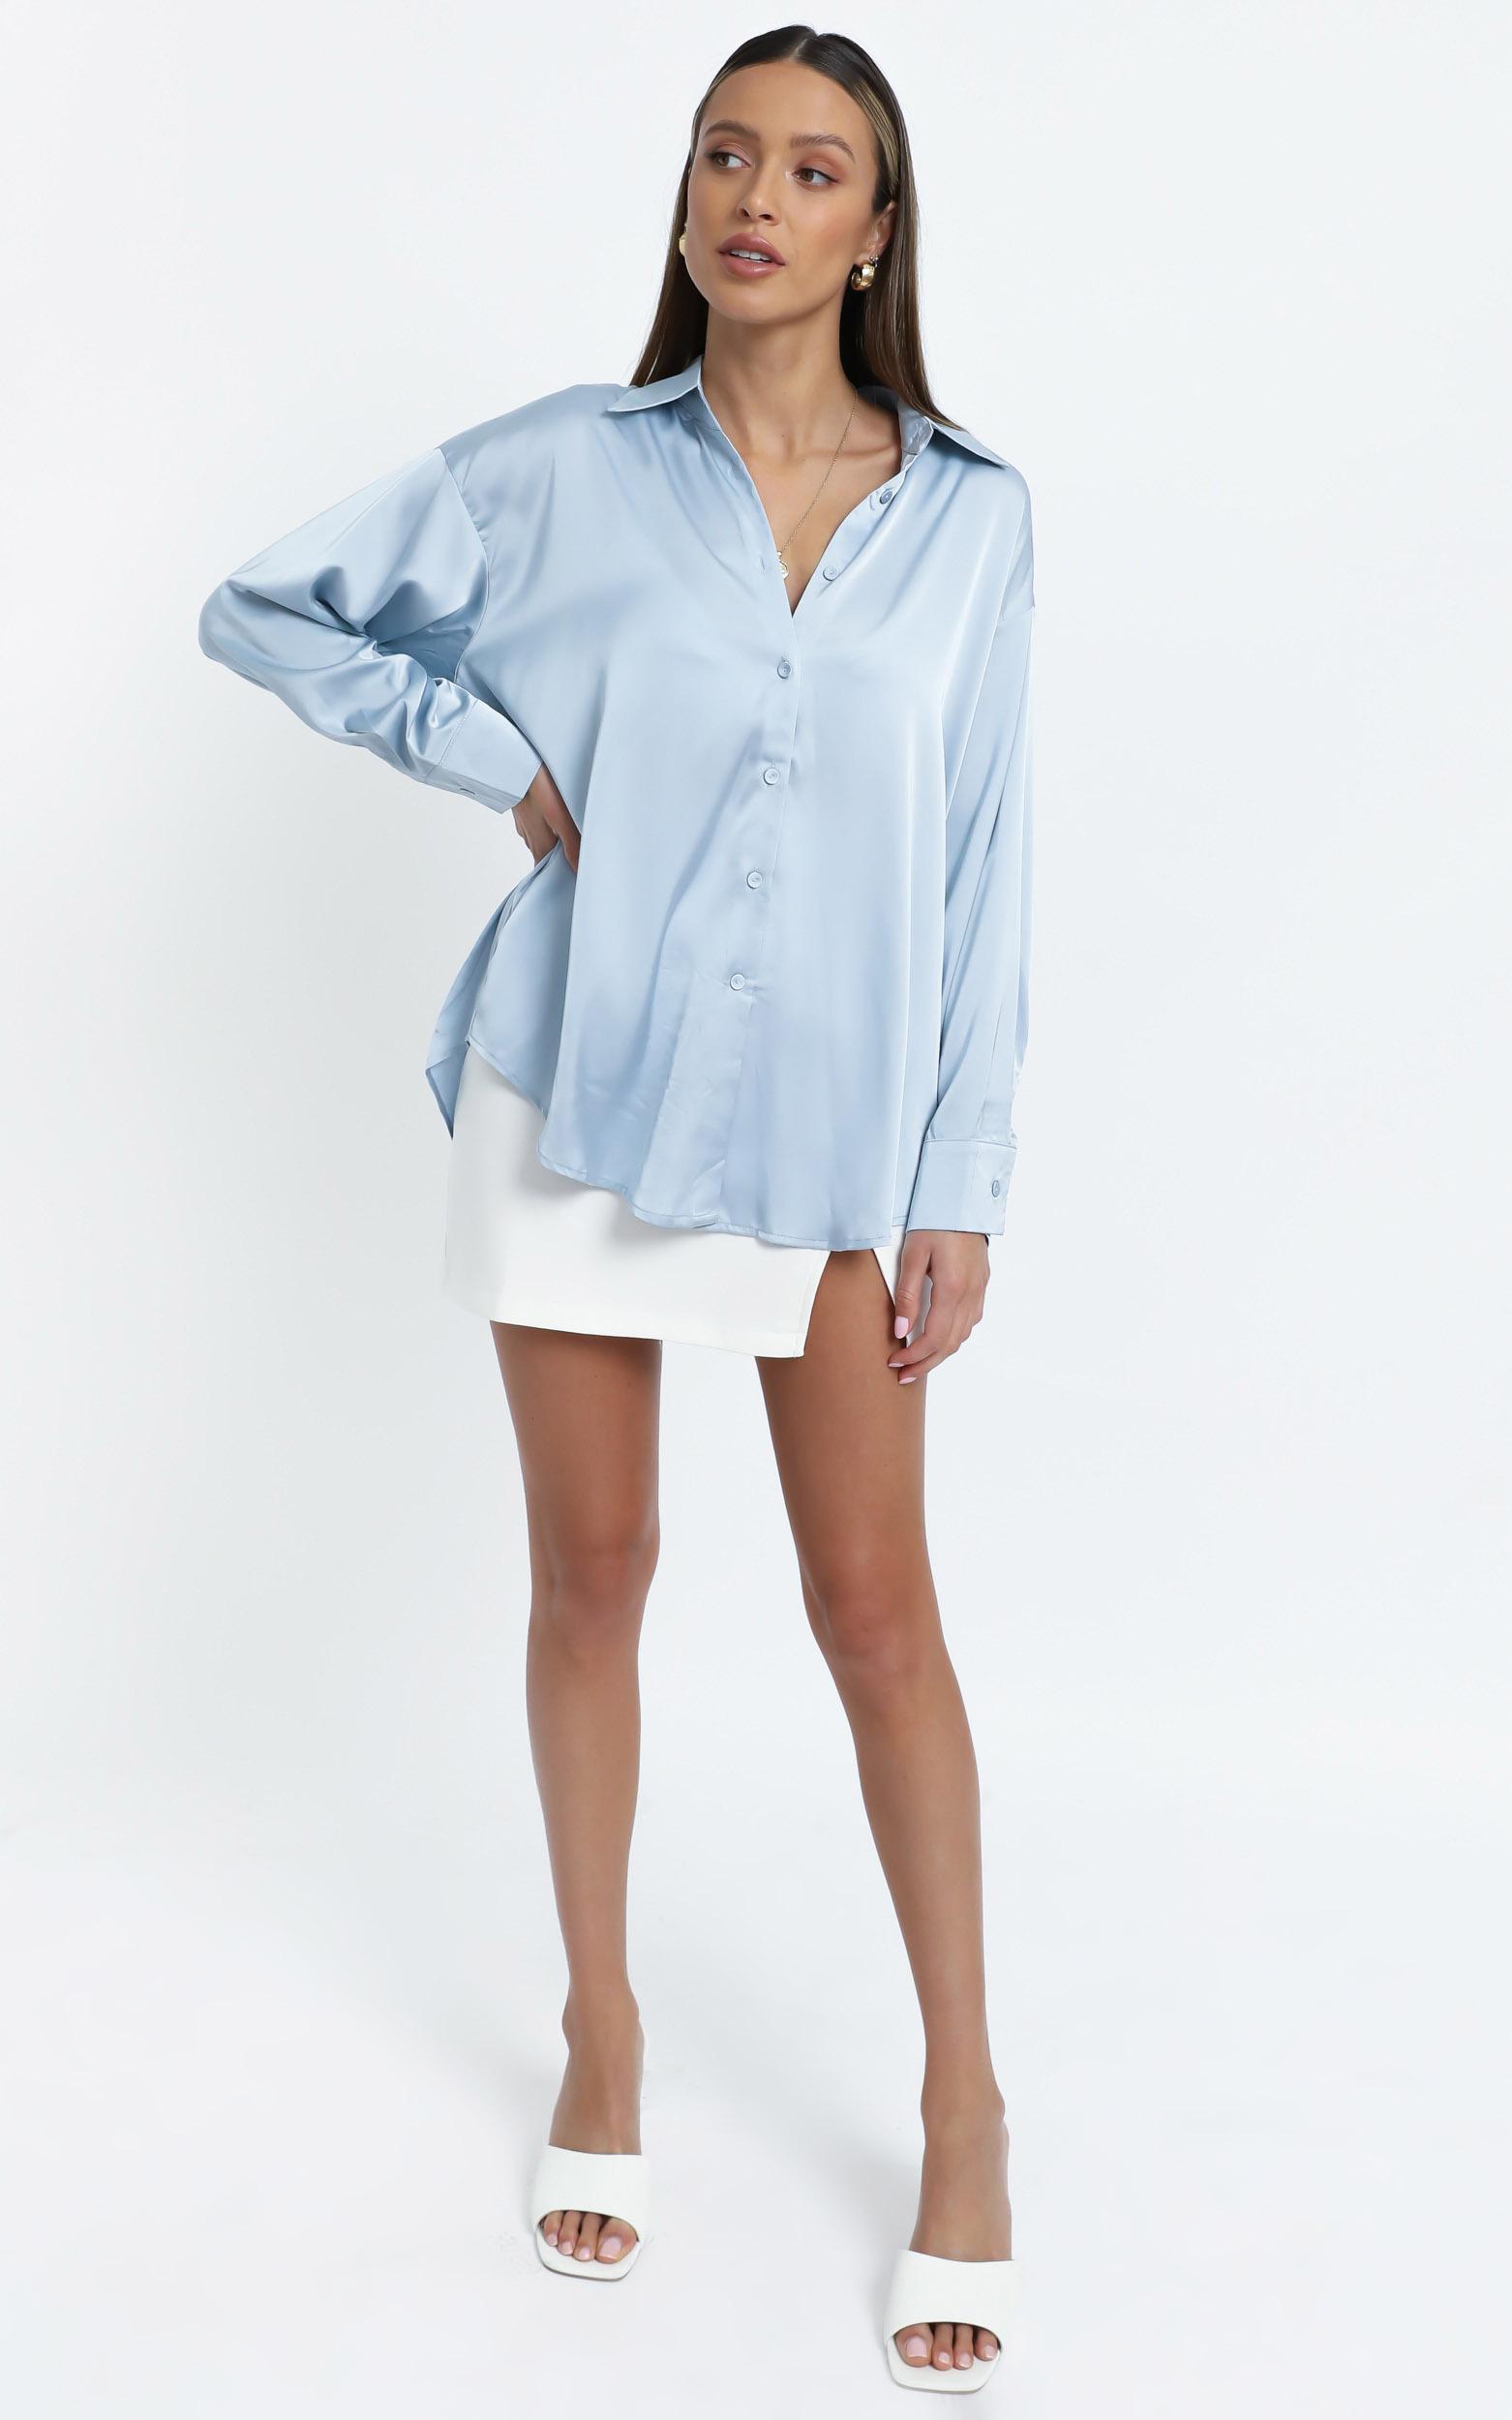 Desiree Shirt in Light Blue Satin - 12 (L), Blue, hi-res image number null